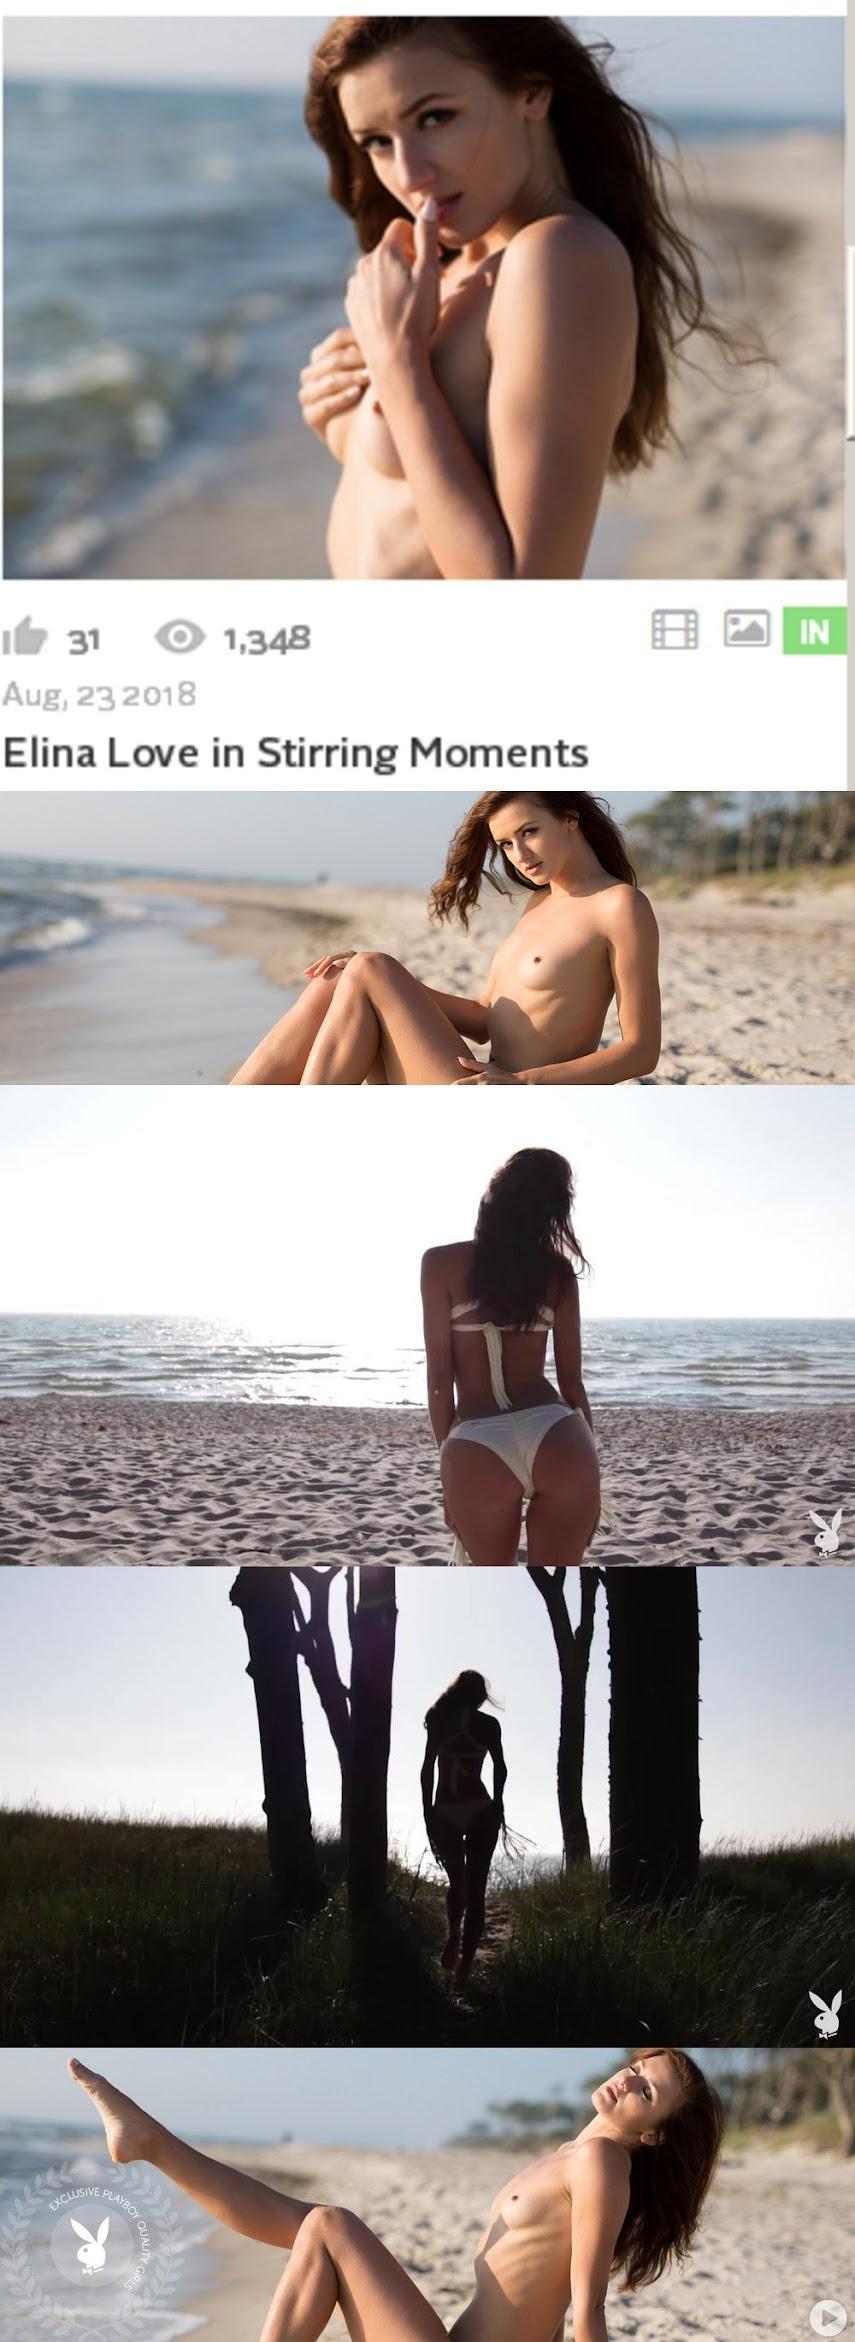 PlayboyPlus2018-08-23_Elina_Love_in_Stirring_Moments.rar-jk- Playboy PlayboyPlus2018-08-23 Elina Love in Stirring Moments playboy 08090